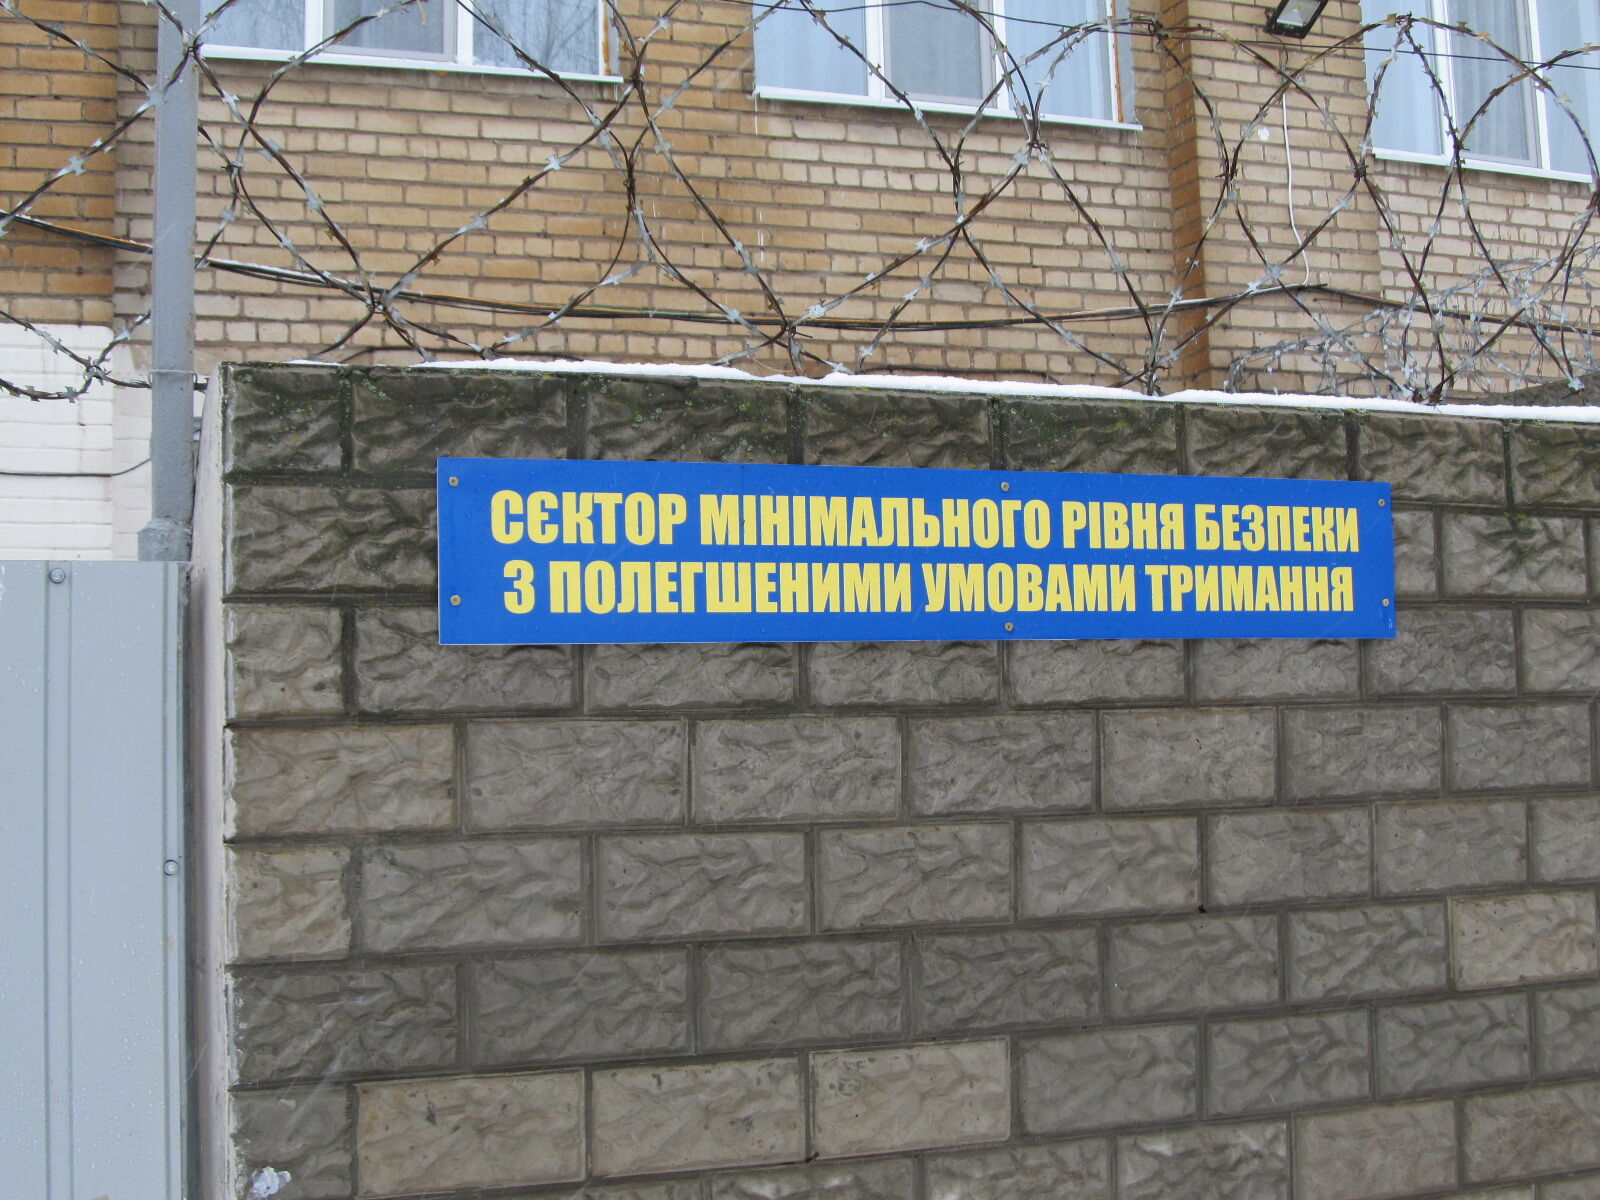 Сектор, где находится Алена Зайцева